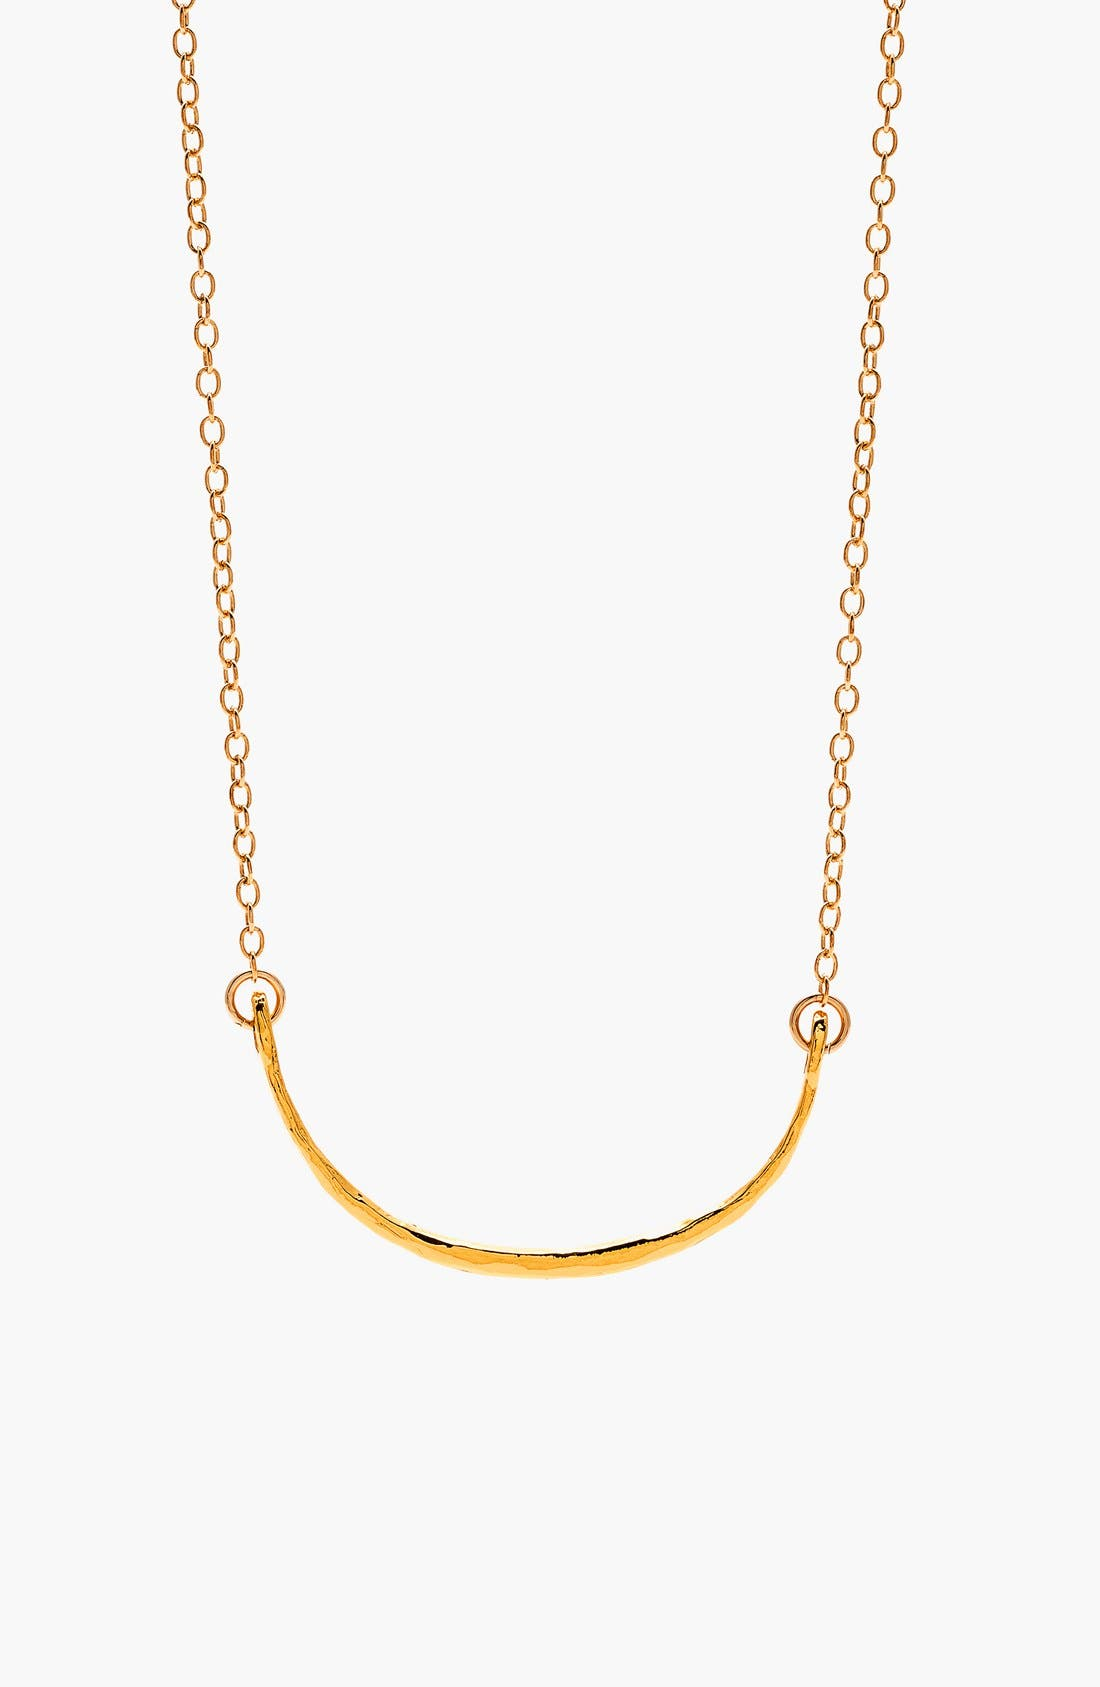 Alternate Image 1 Selected - gorjana 'Taner' Curved Pendant Necklace